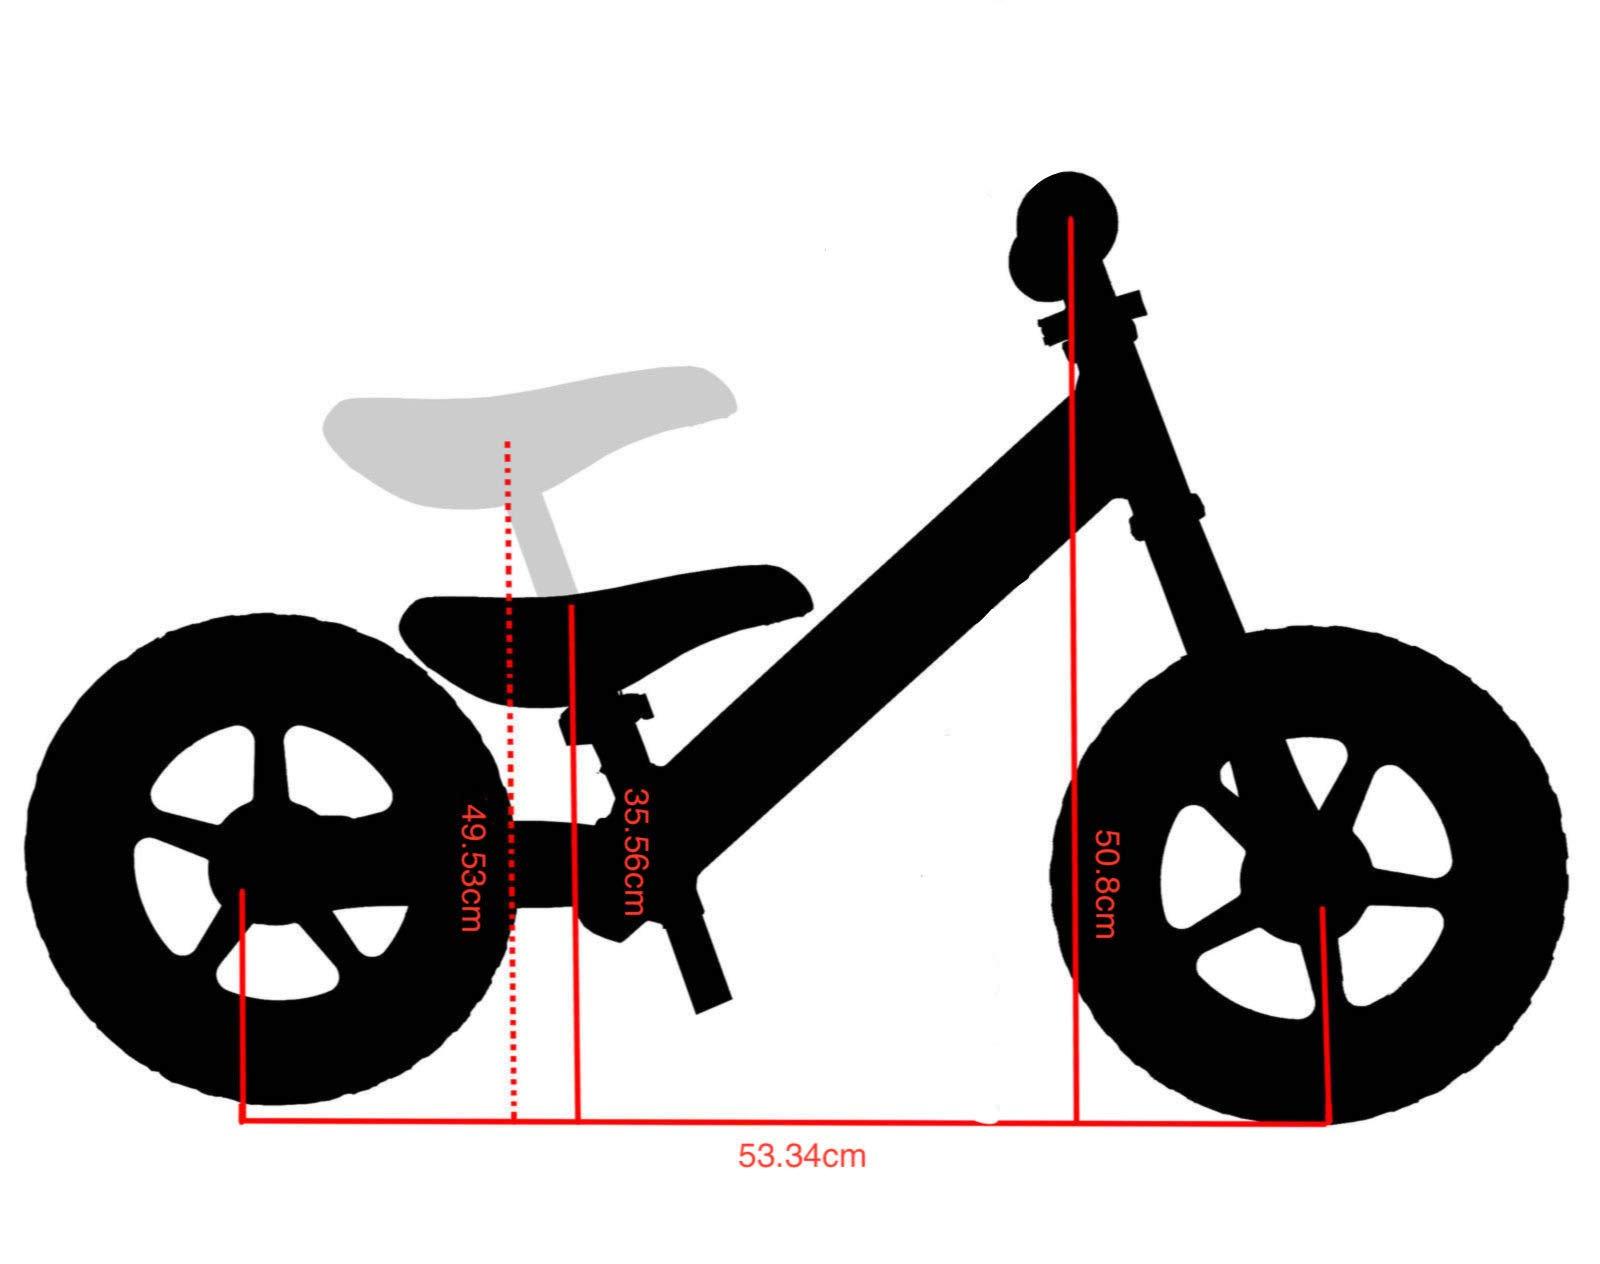 CyclingDeal Alloy Kids Push Balance No-Pedal Bike 12'' Black by CyclingDeal (Image #6)